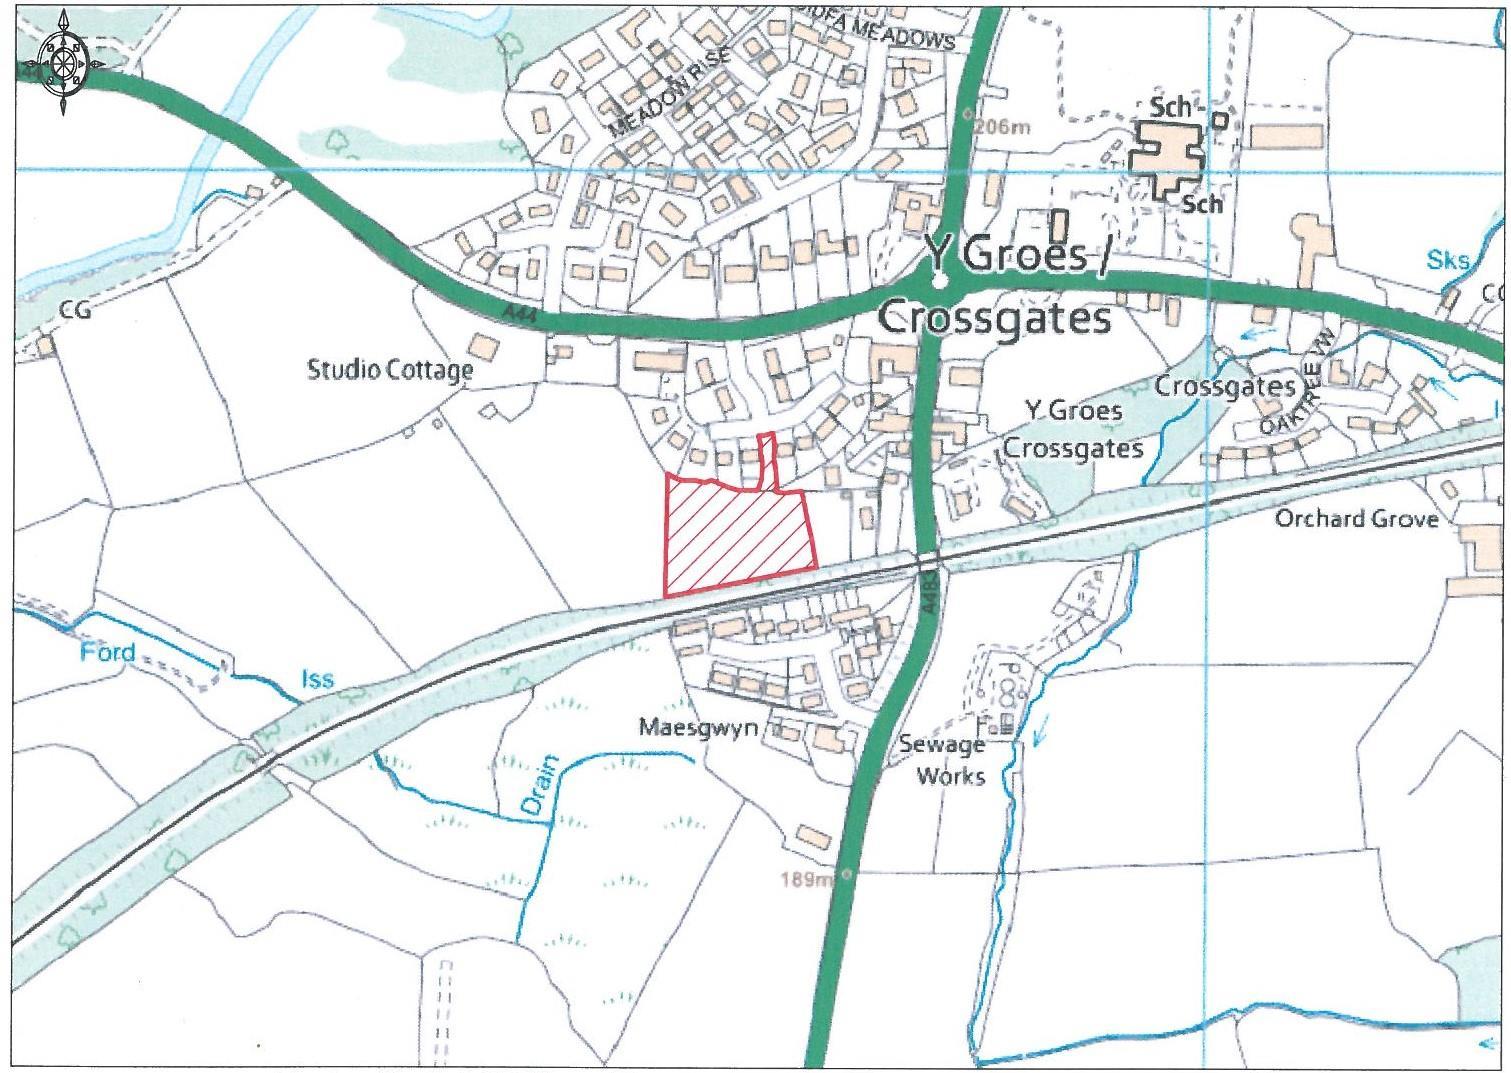 Image of Badgers Green, Crossgates, Llandrindod Wells